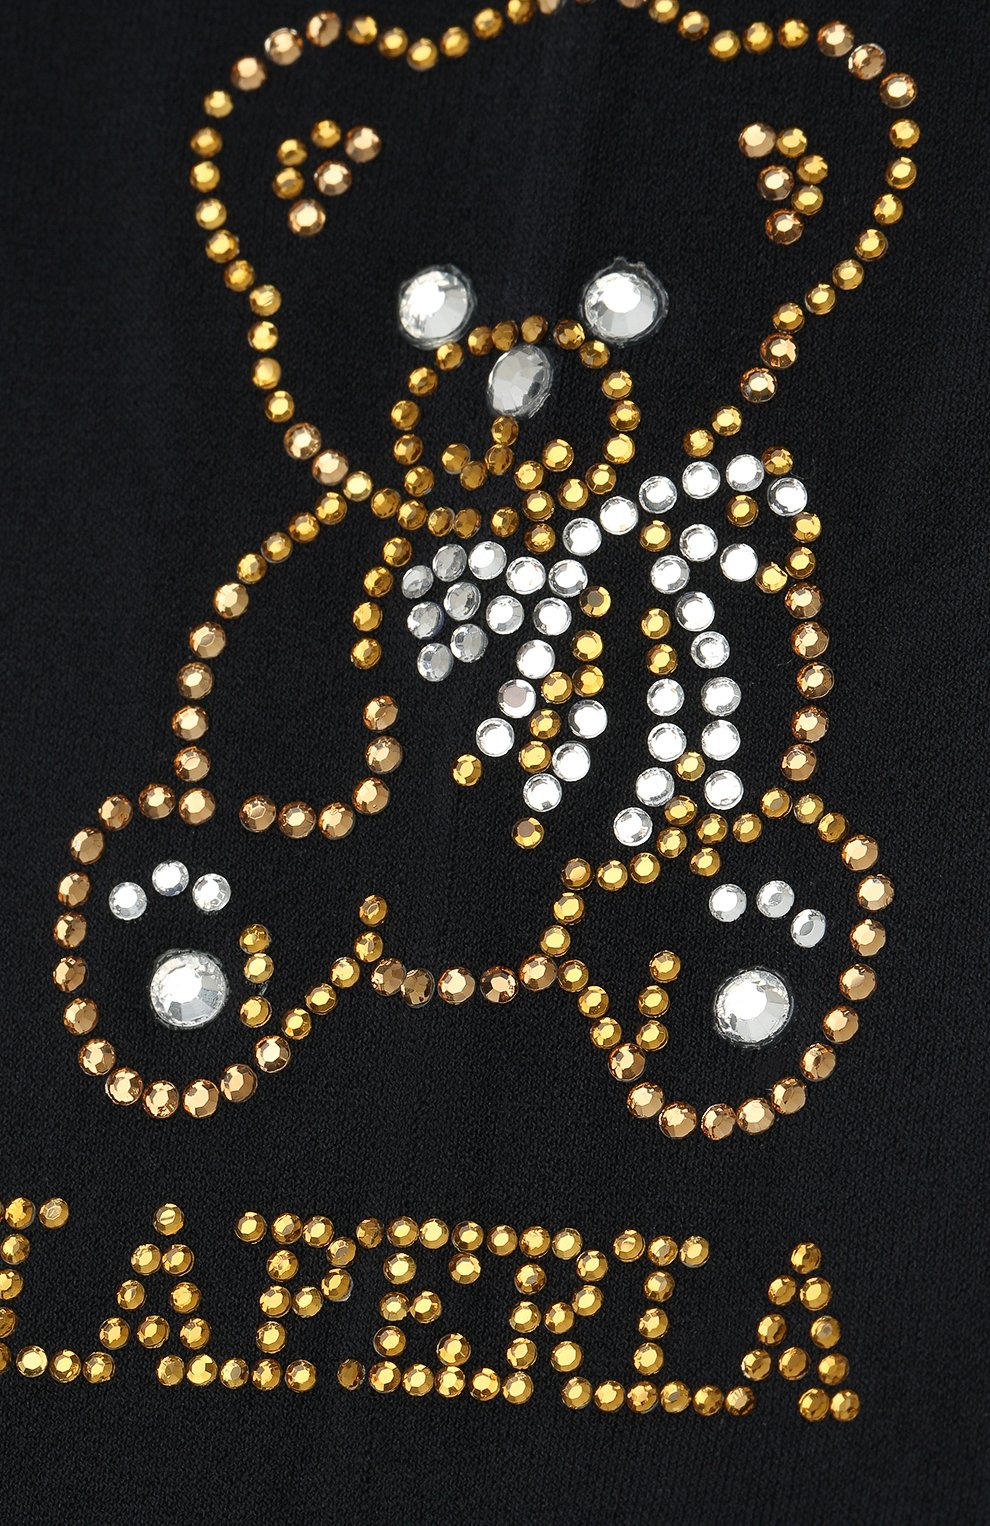 Детские колготки LA PERLA синего цвета, арт. 47340/1-3 | Фото 2 (Материал: Текстиль)